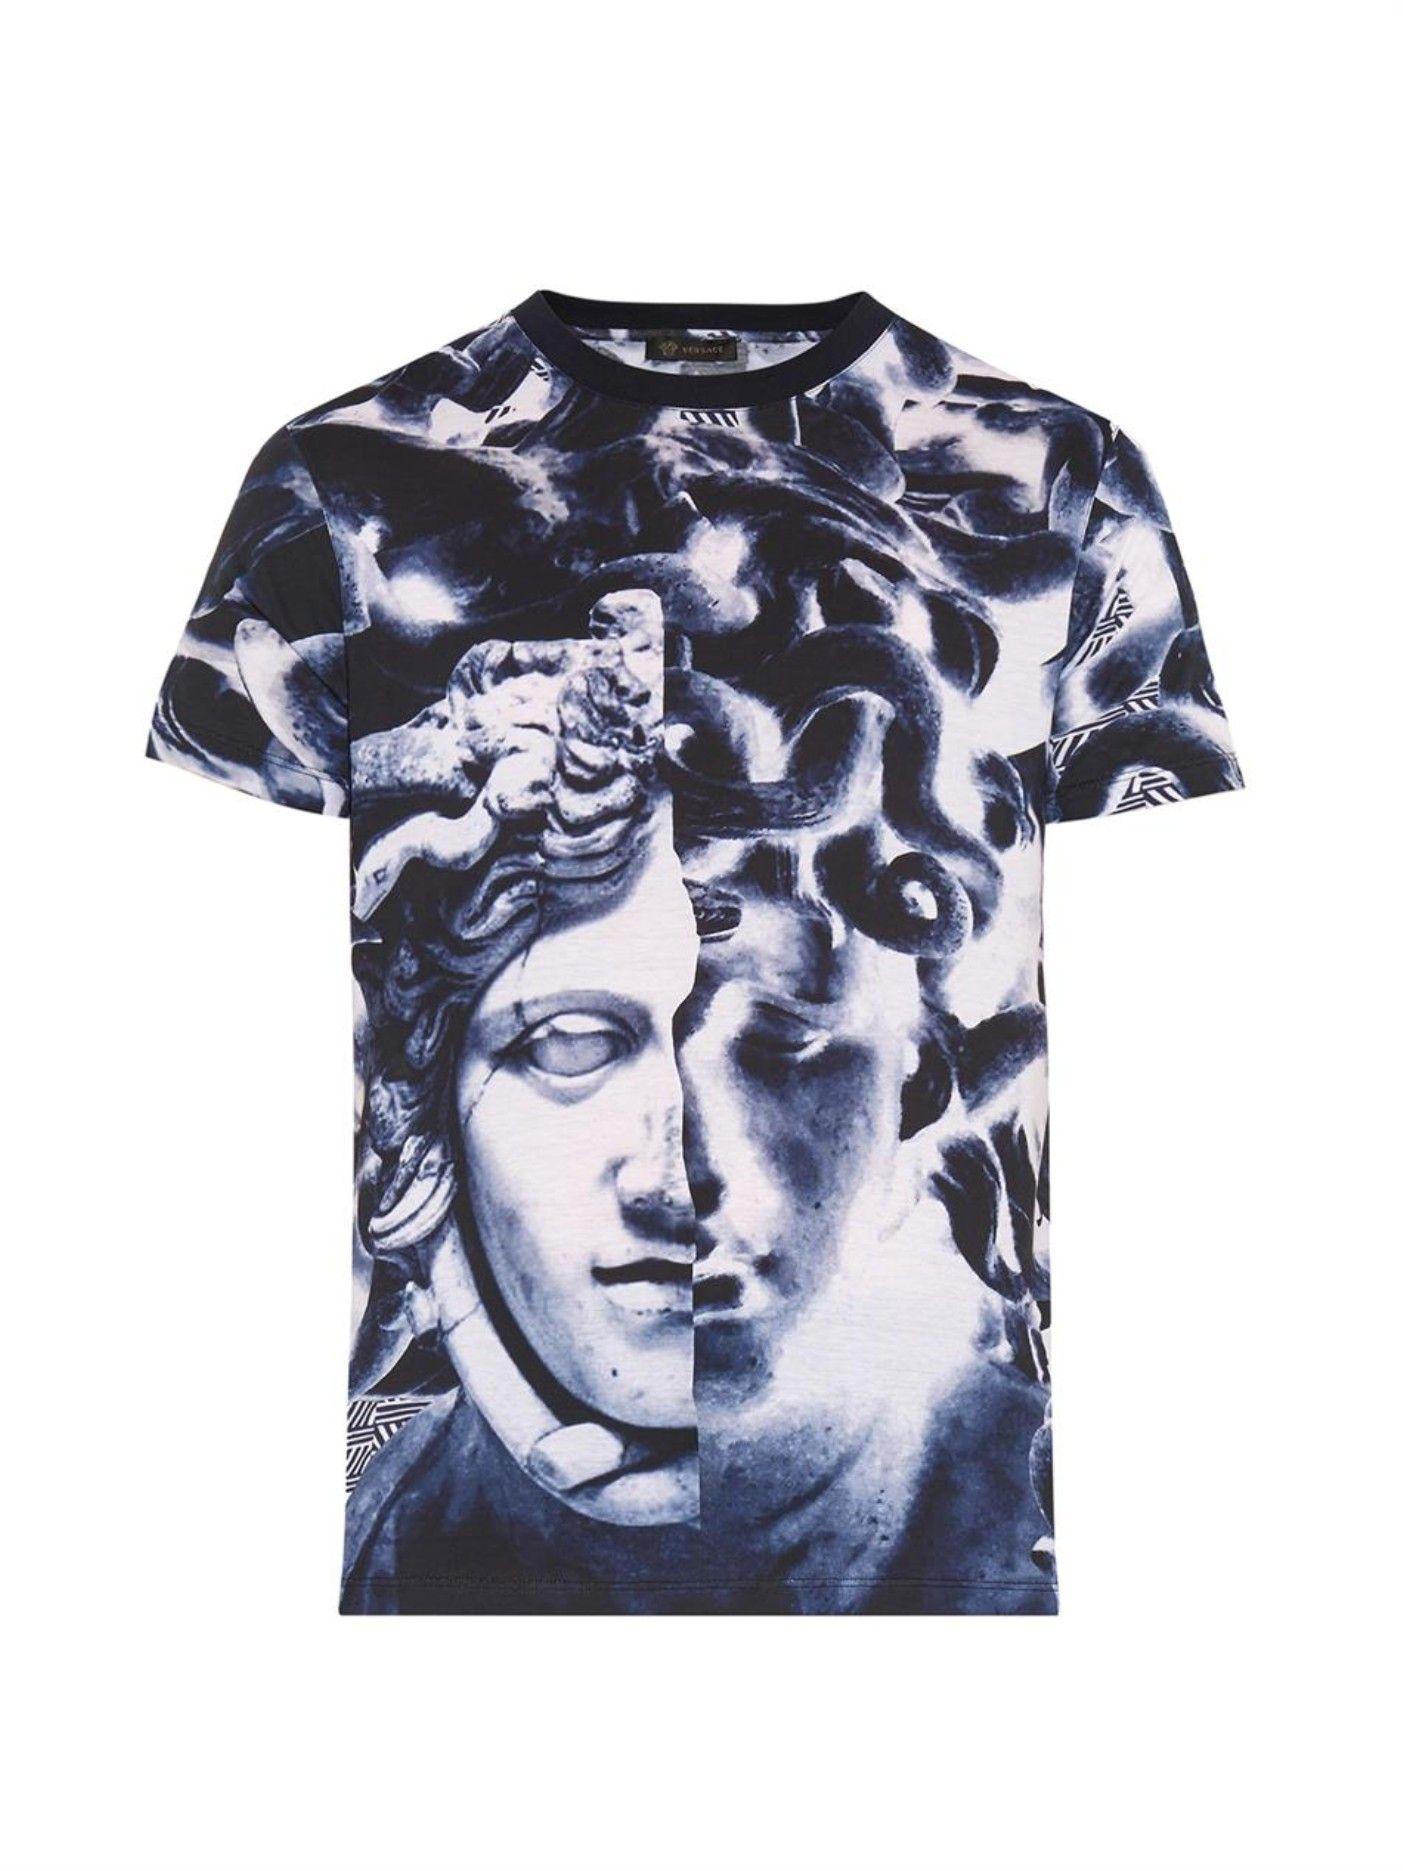 9b77805c6 Bernini Medusa-print T-shirt | Versace | MATCHESFASHION.COM US ...